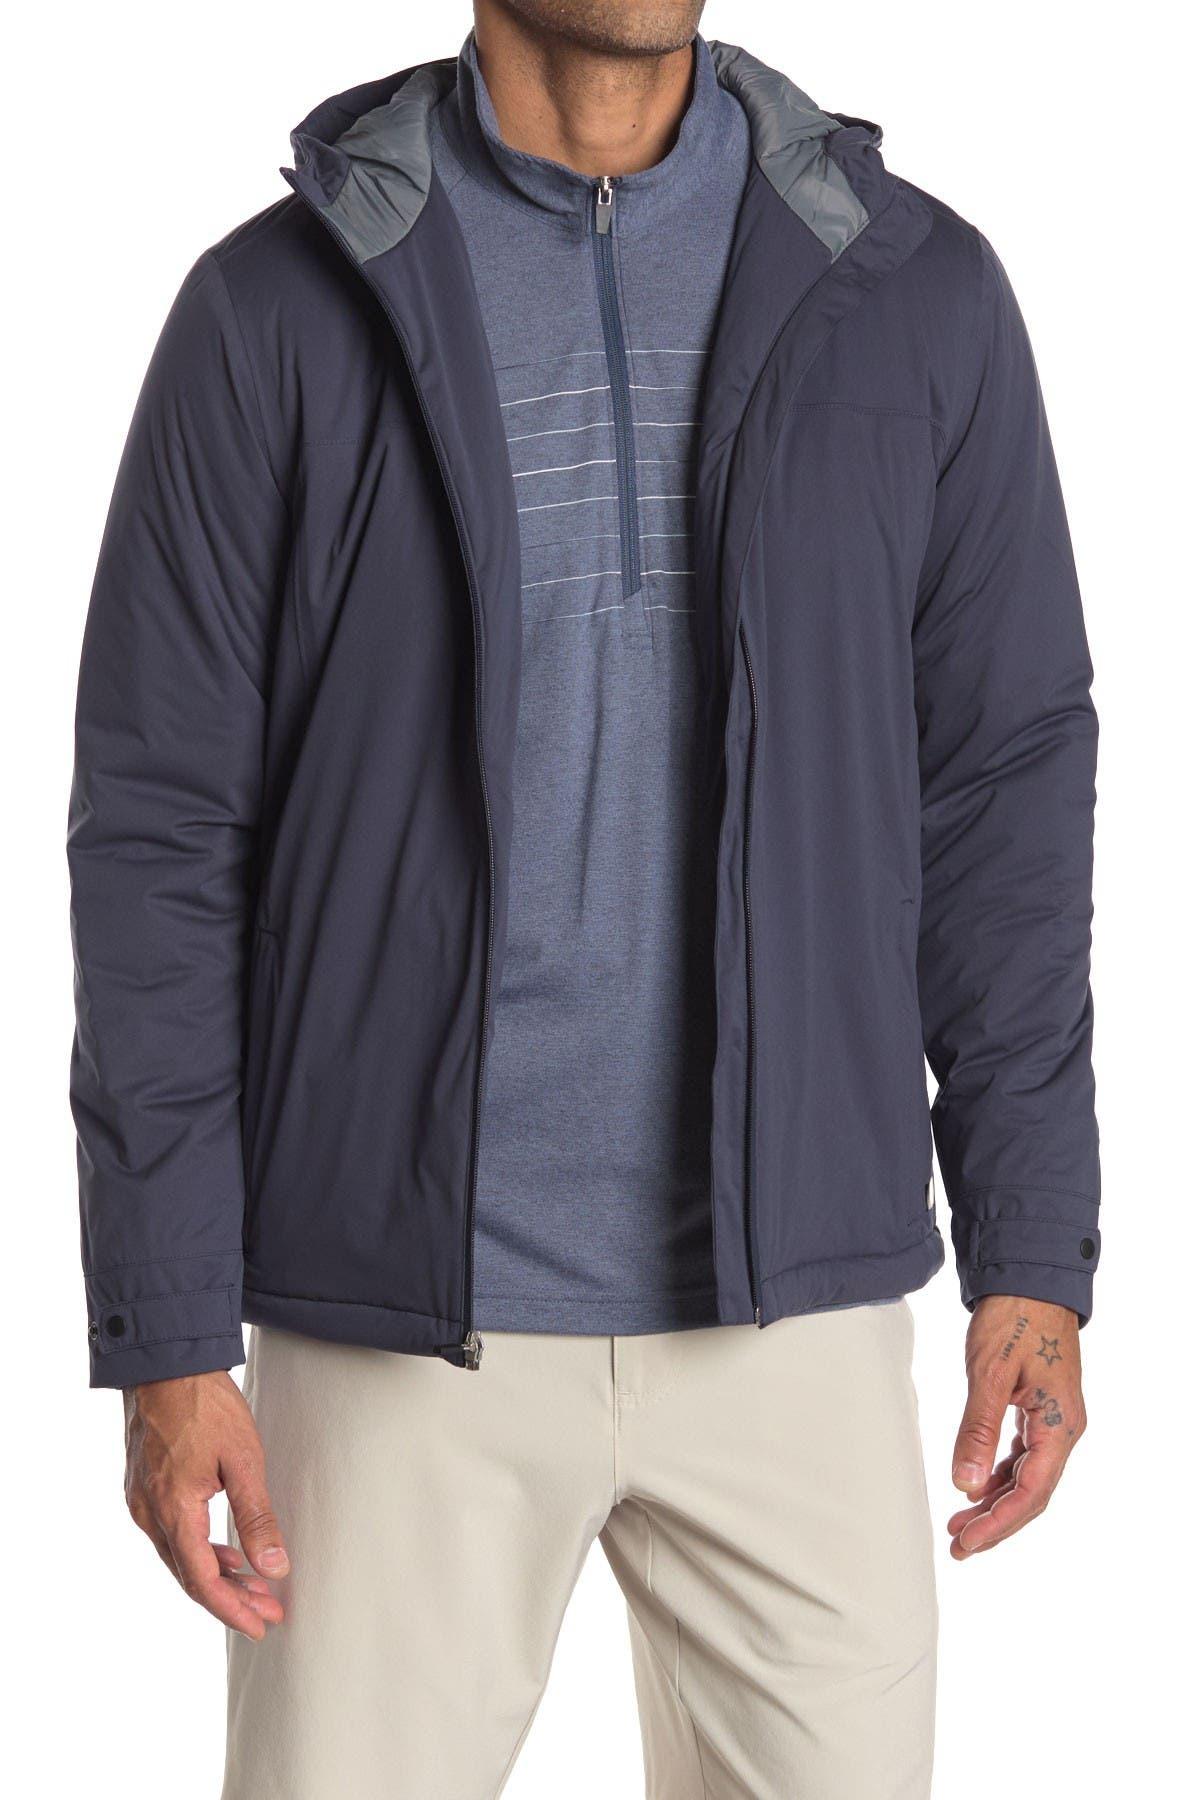 Image of TRAVIS MATHEW Raincheck Front Zip Jacket